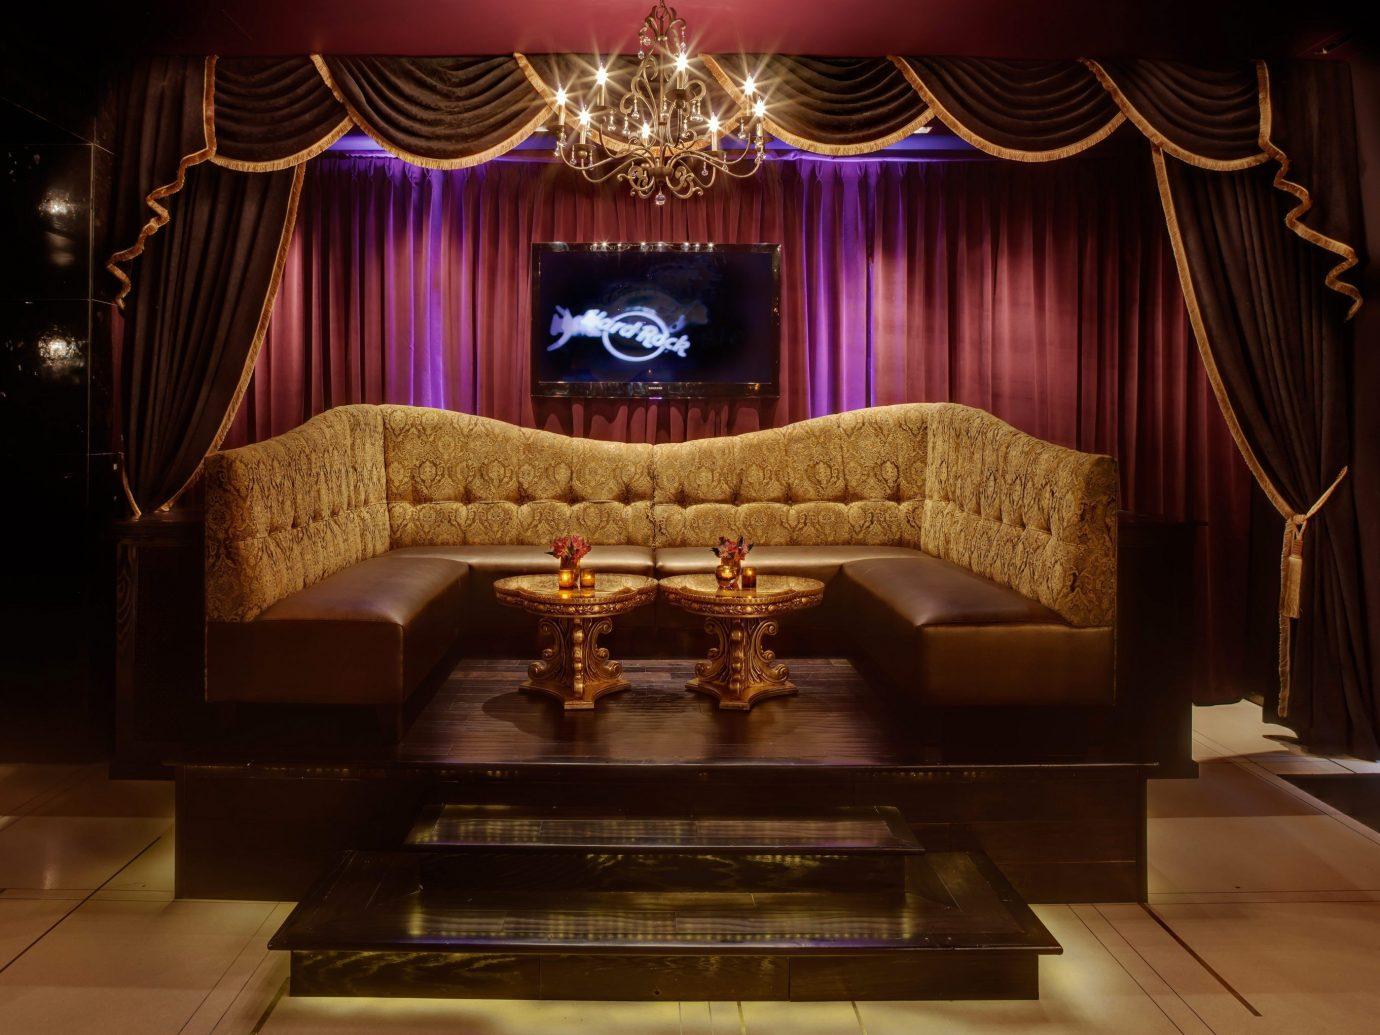 Hotels indoor stage interior design theatre Lobby curtain decorated